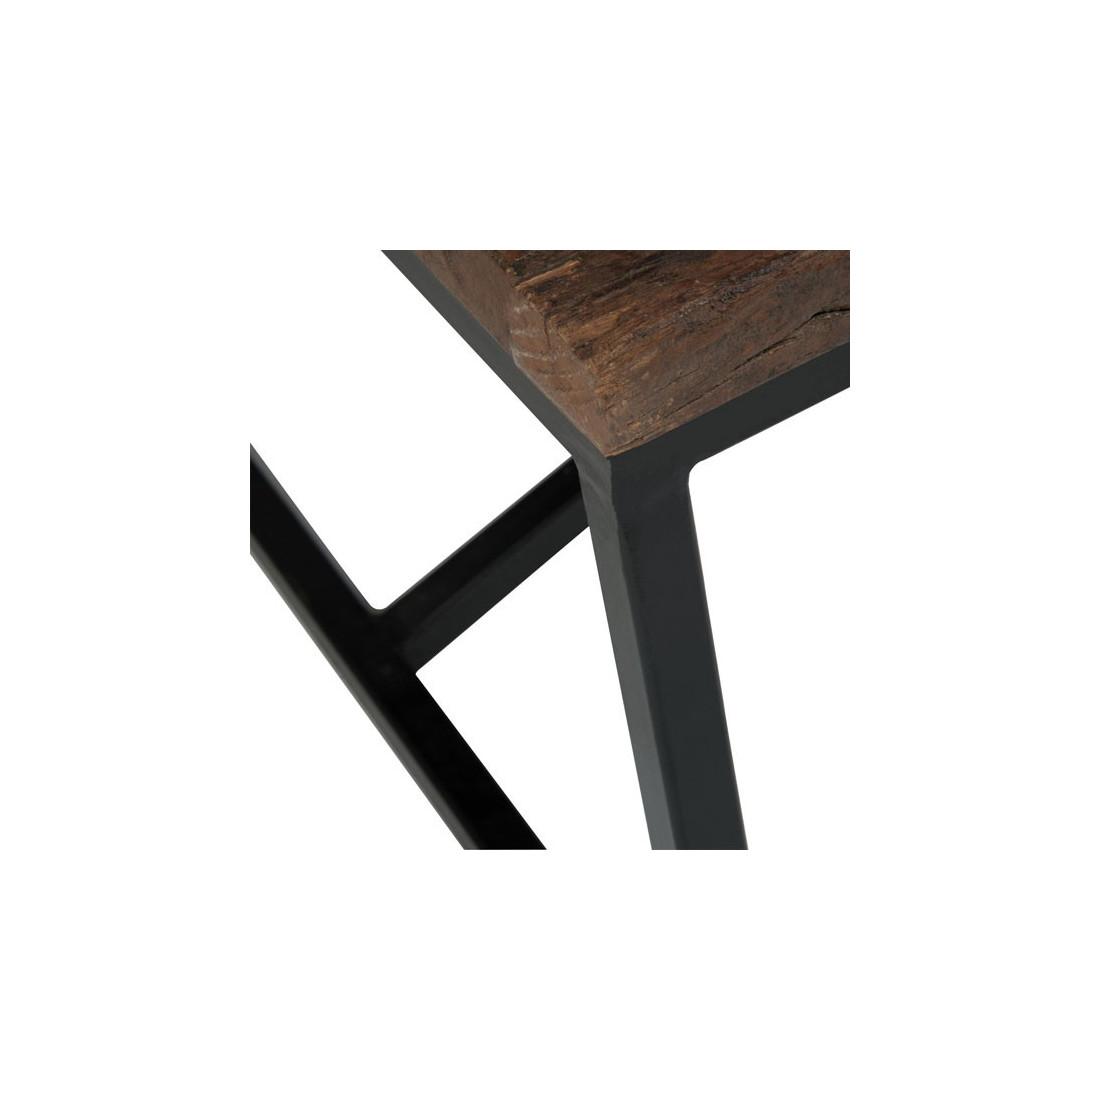 table basse industrielle plateau bois brut povy univers. Black Bedroom Furniture Sets. Home Design Ideas